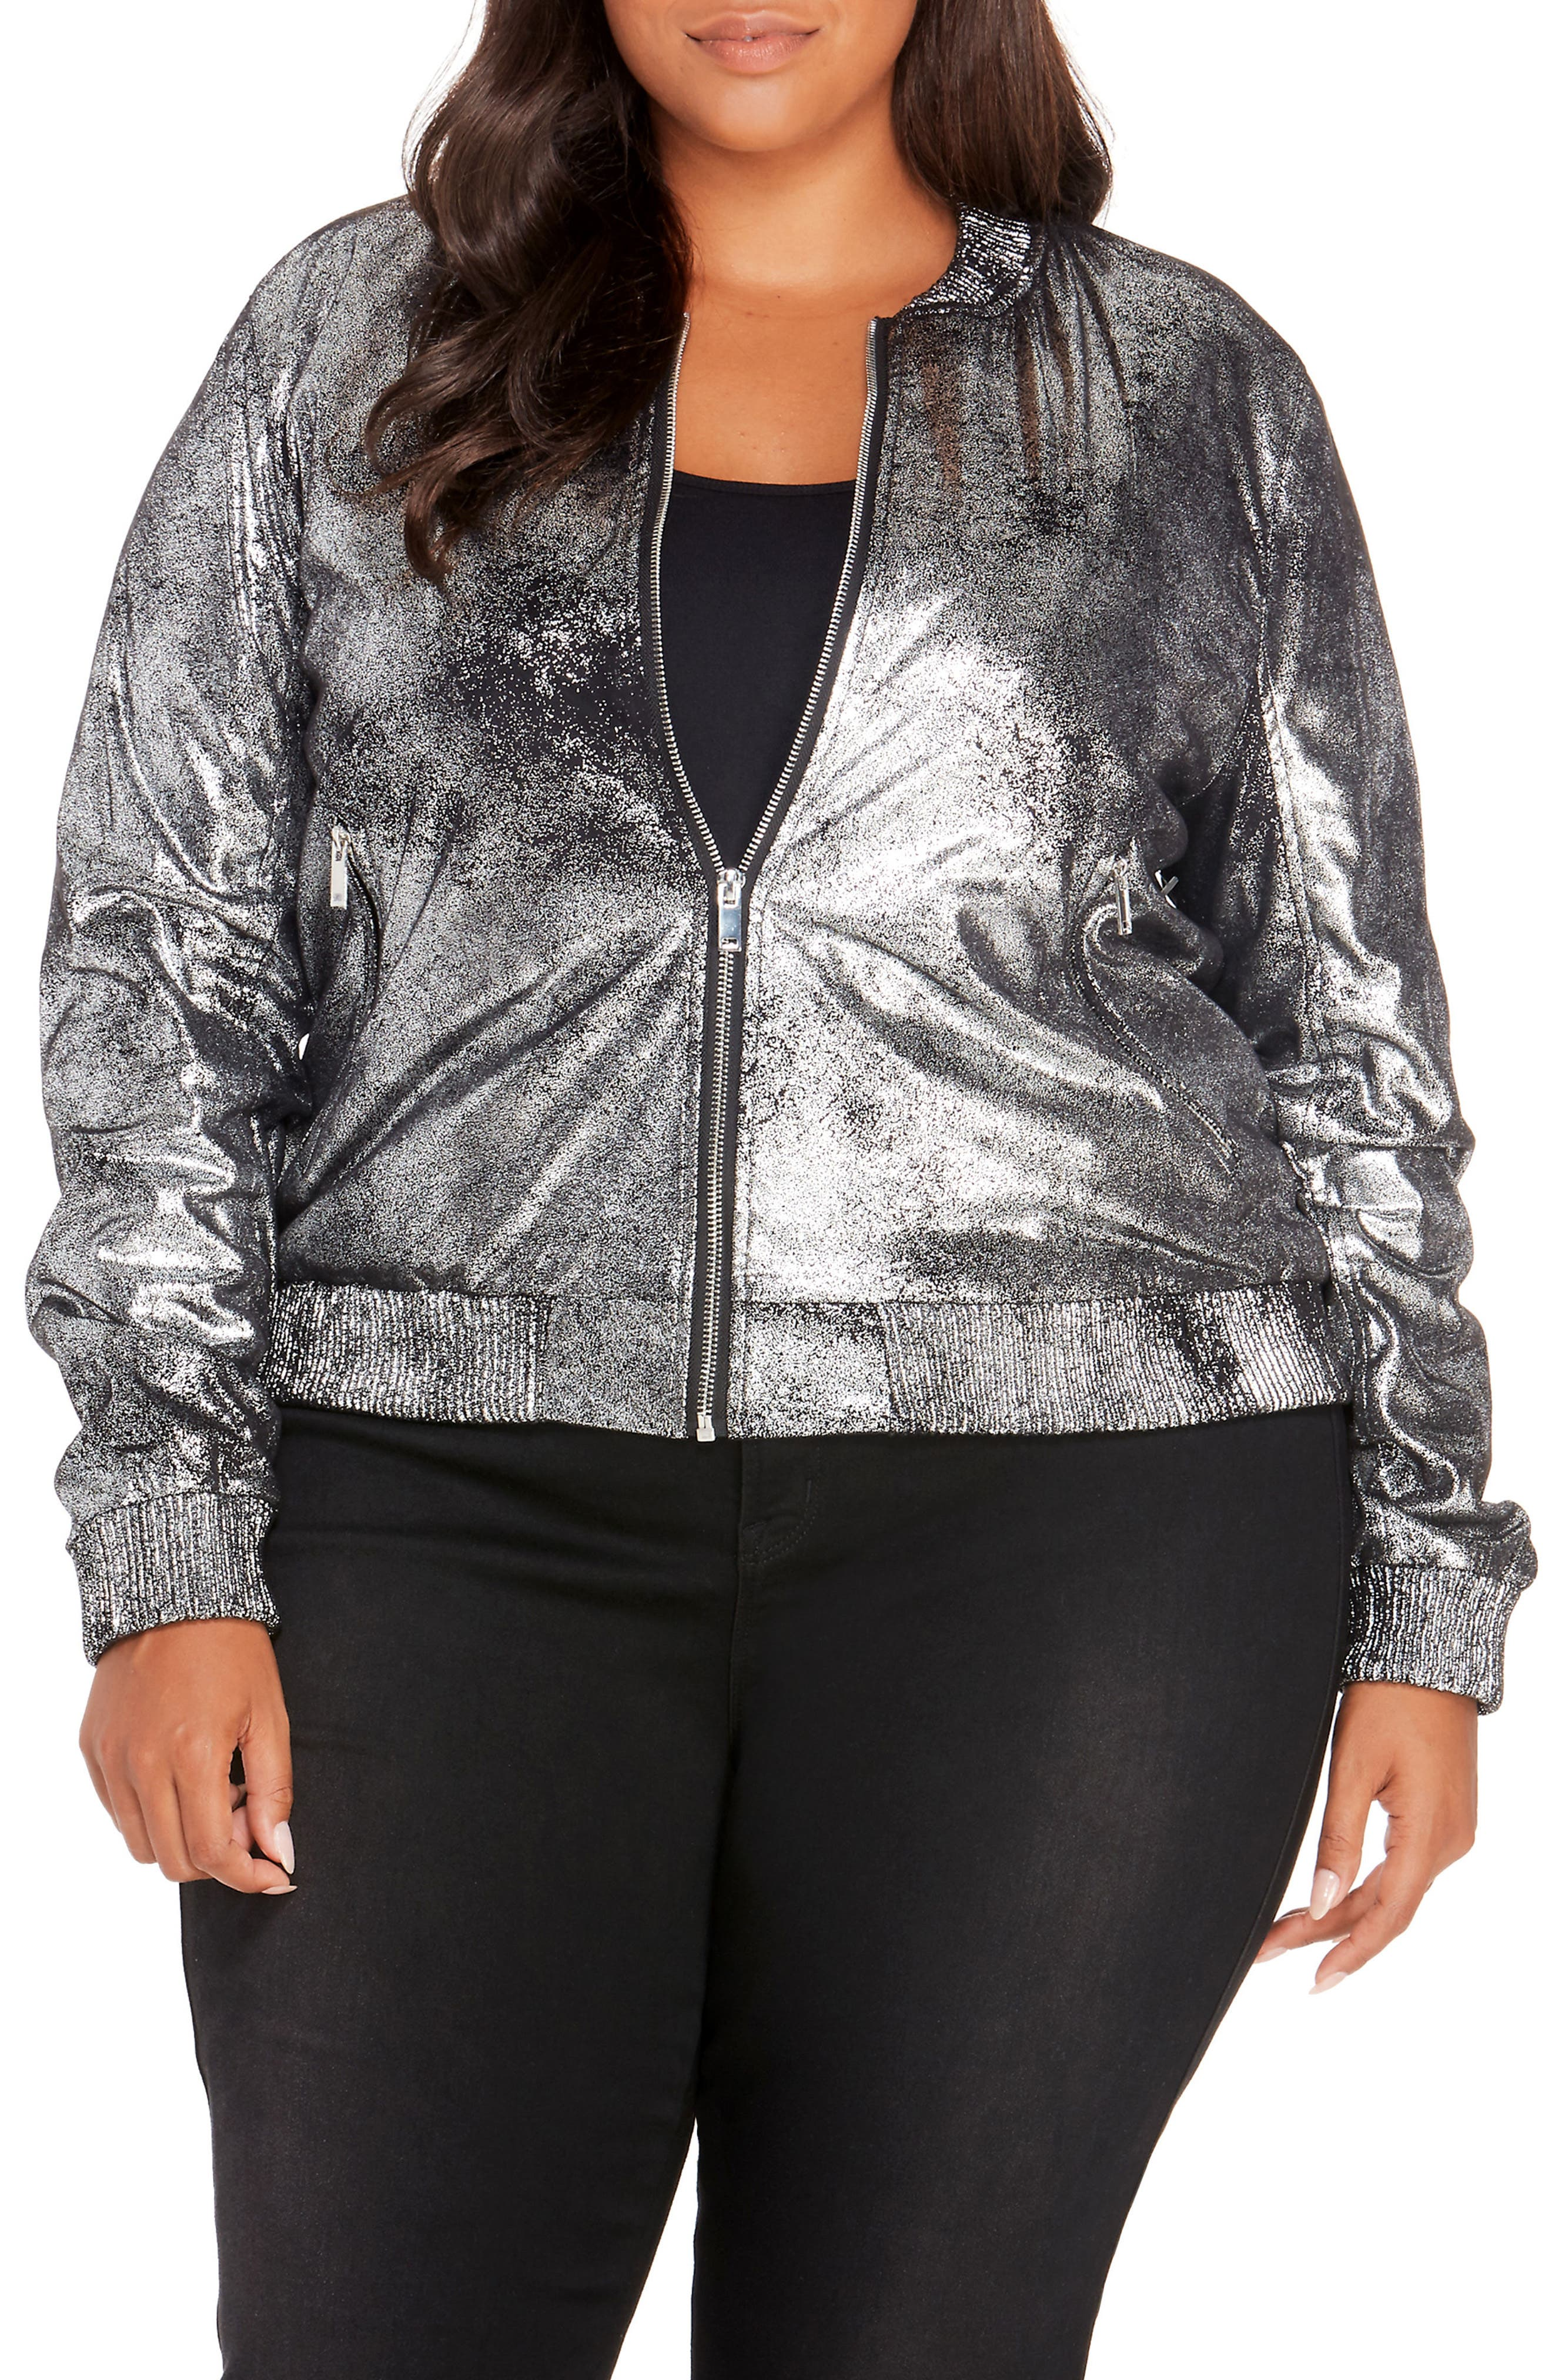 Metallic Bomber Jacket,                         Main,                         color, Black/ Silver